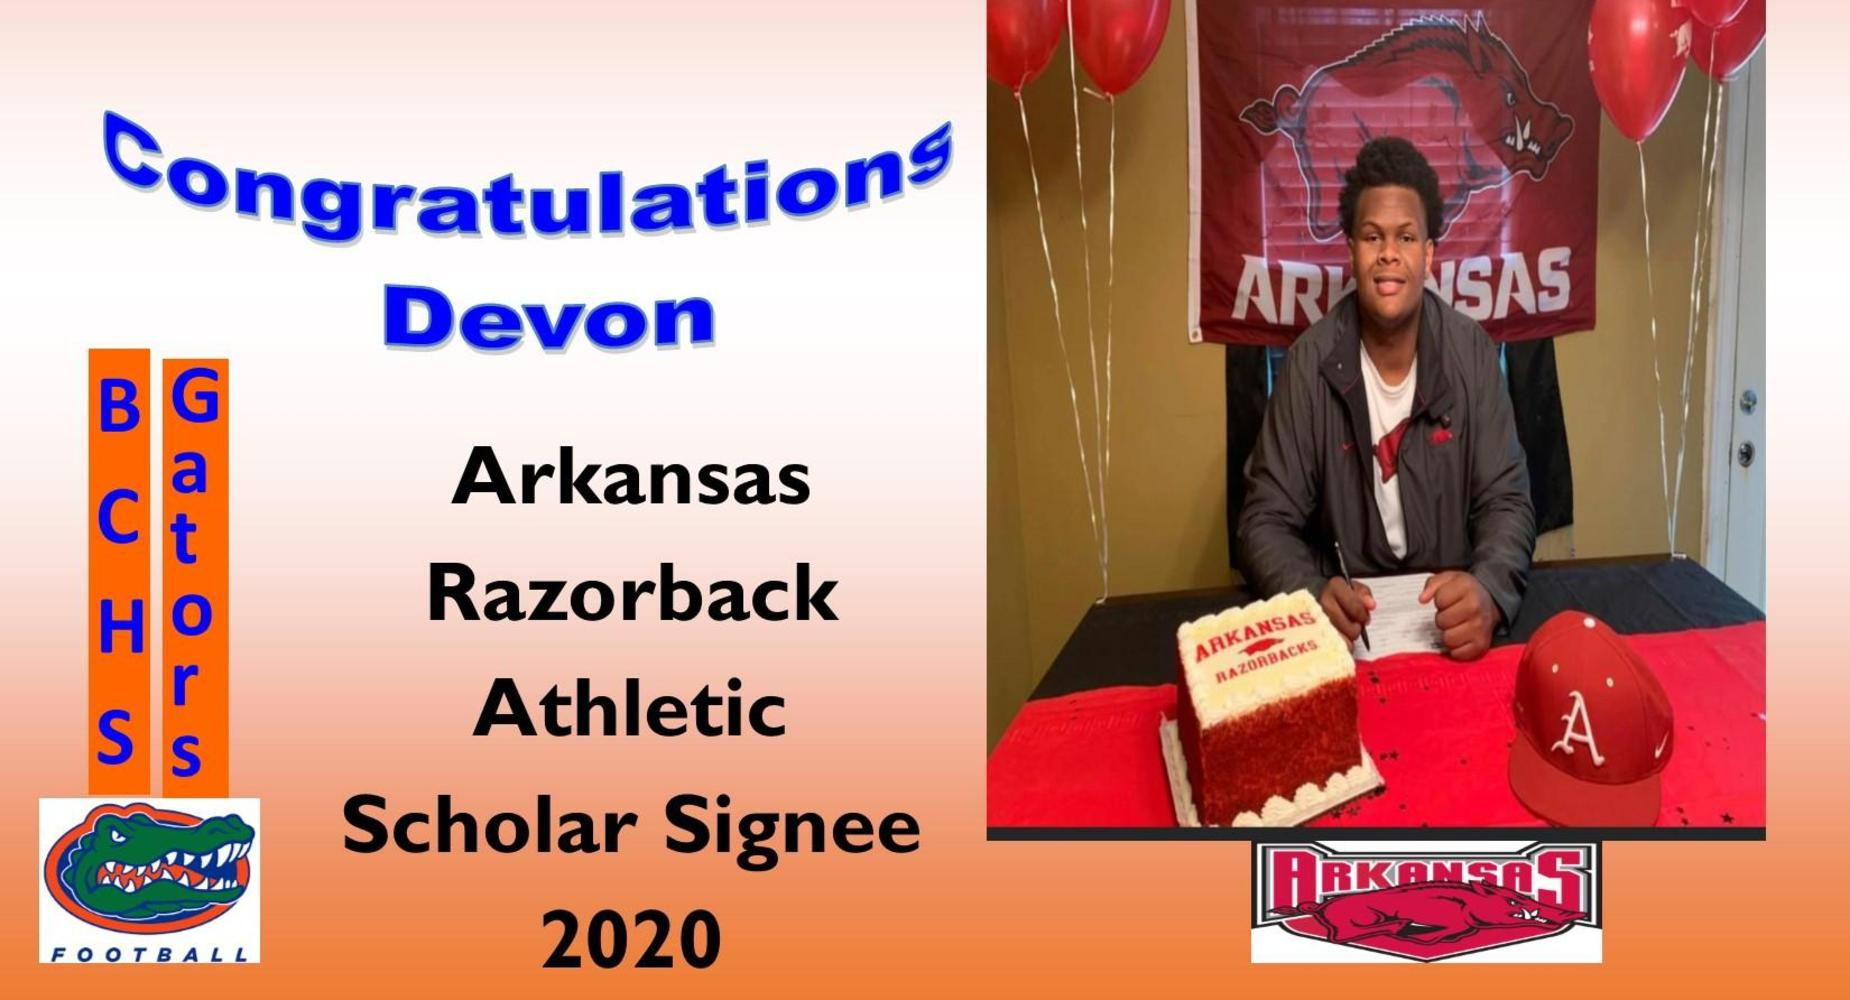 Congratulations to Devon Manuel Arkansas Razorback Scholar Signee 2020